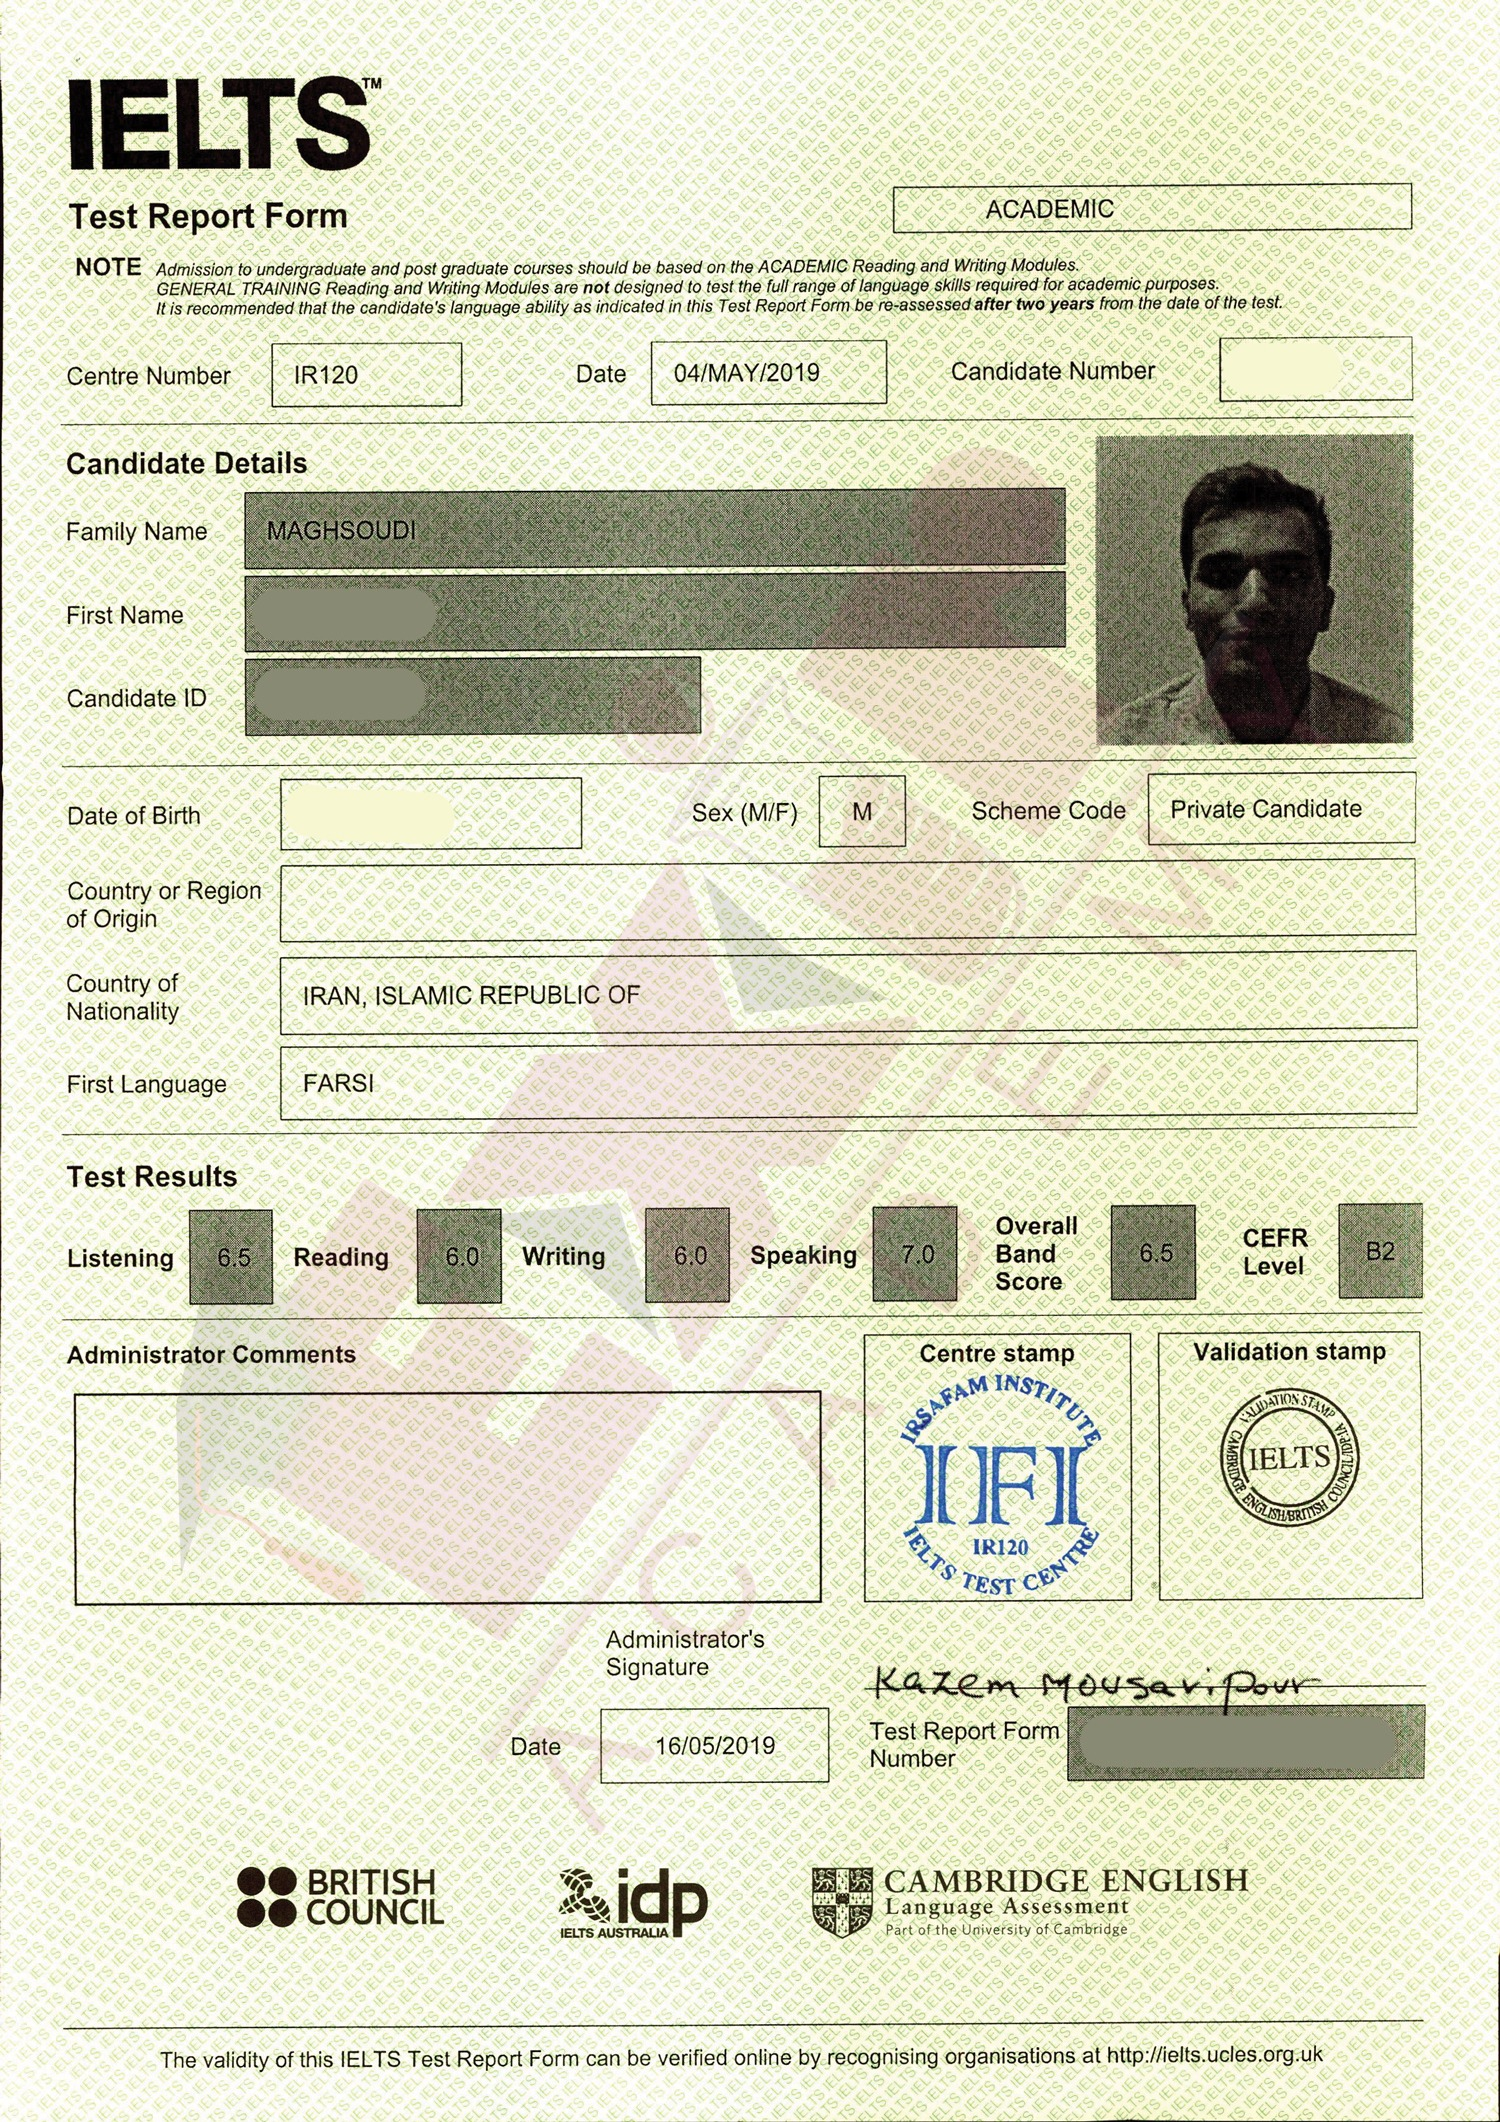 IELTS-TRF-Mr-Maqsoudi